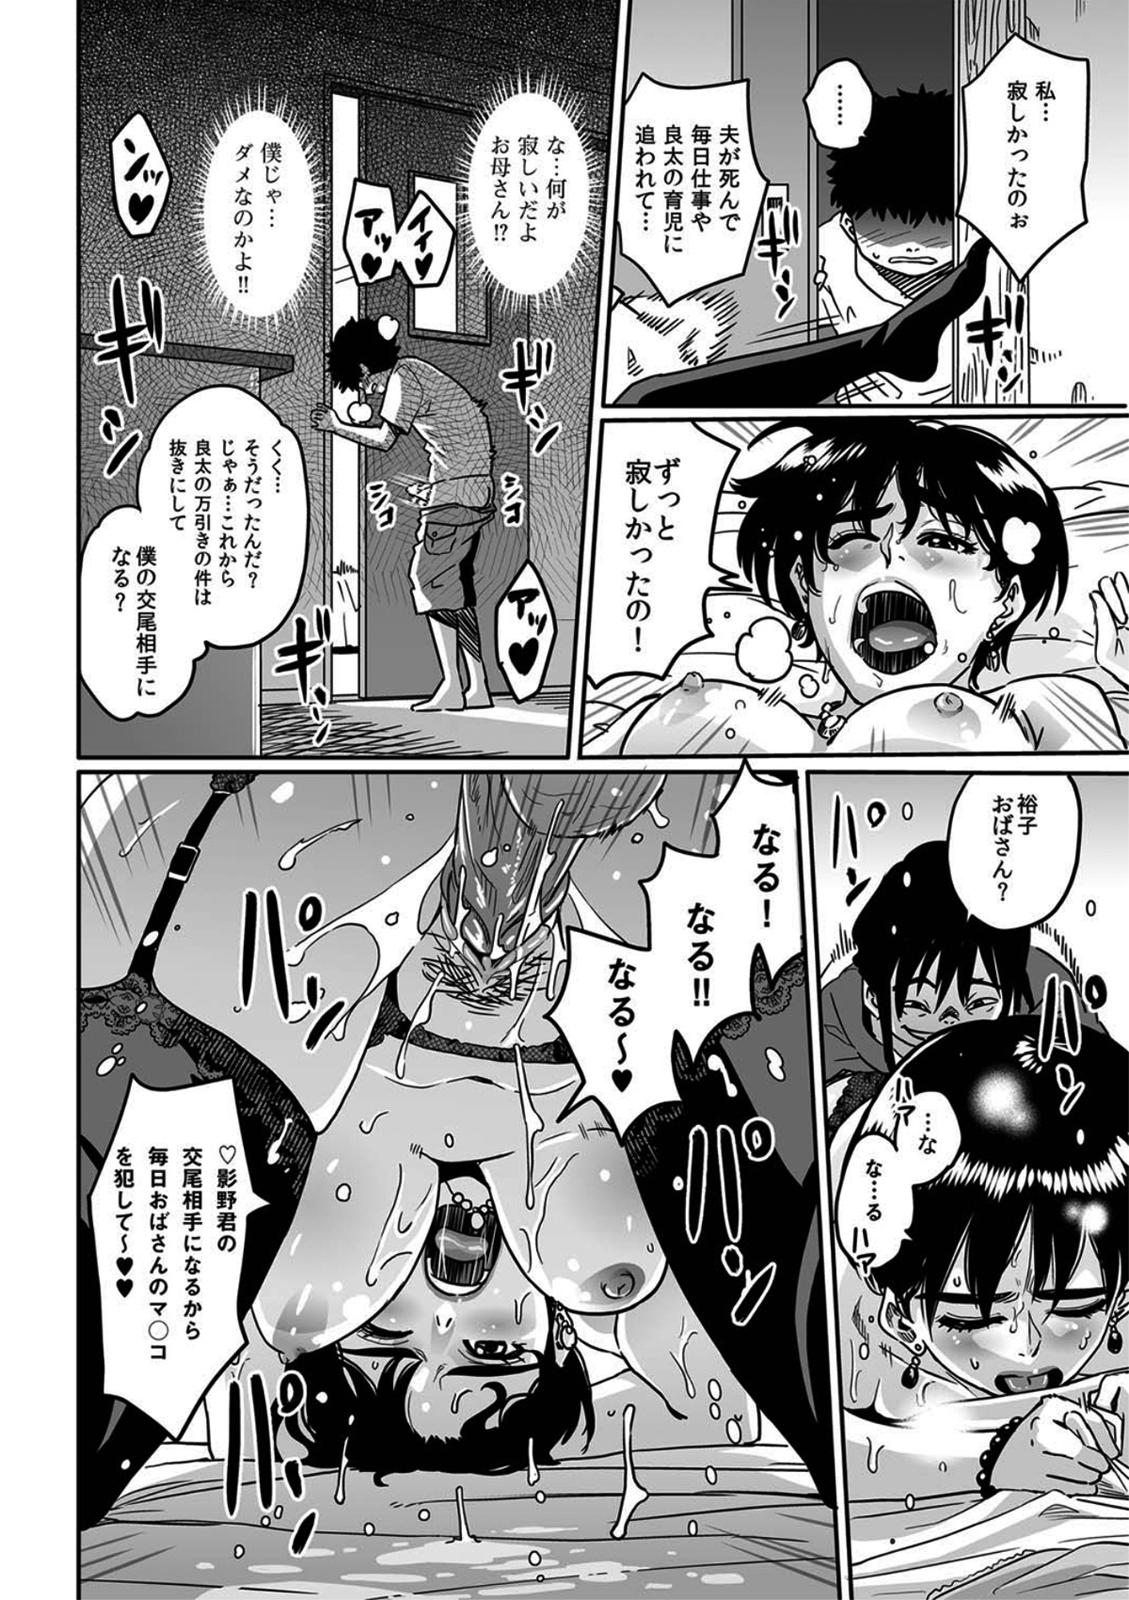 Okaa-san no Koubi 13